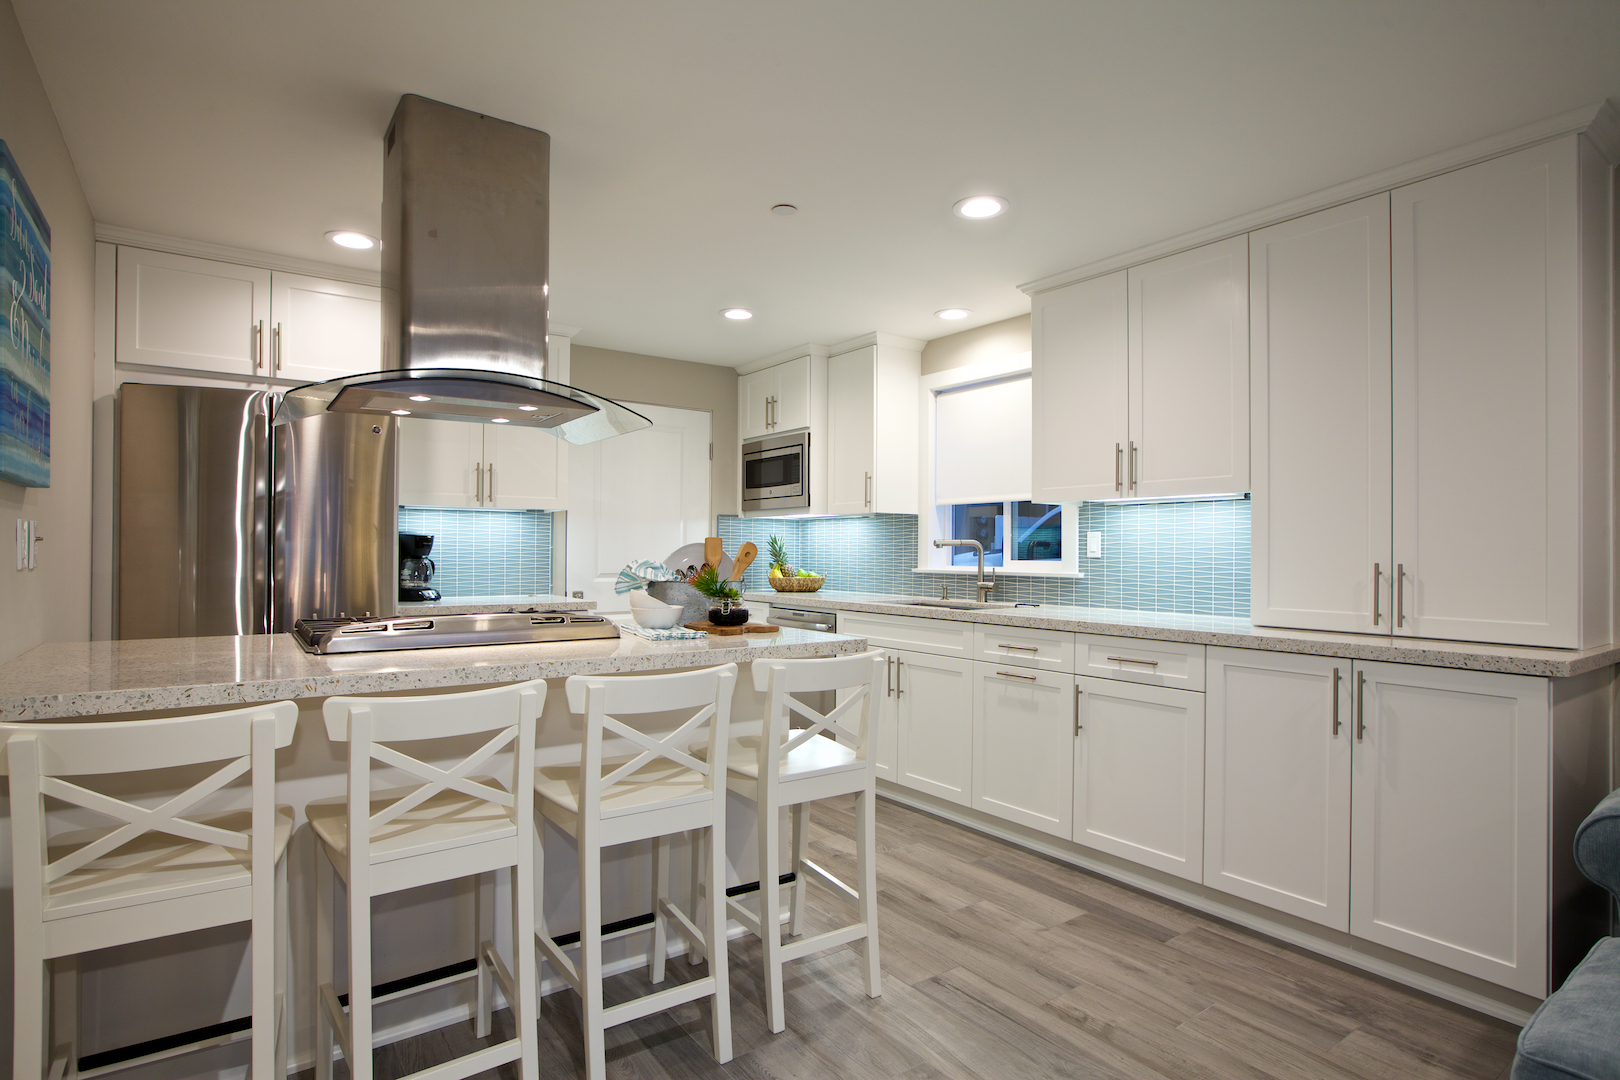 Kitchen Remodel California Interior Designer